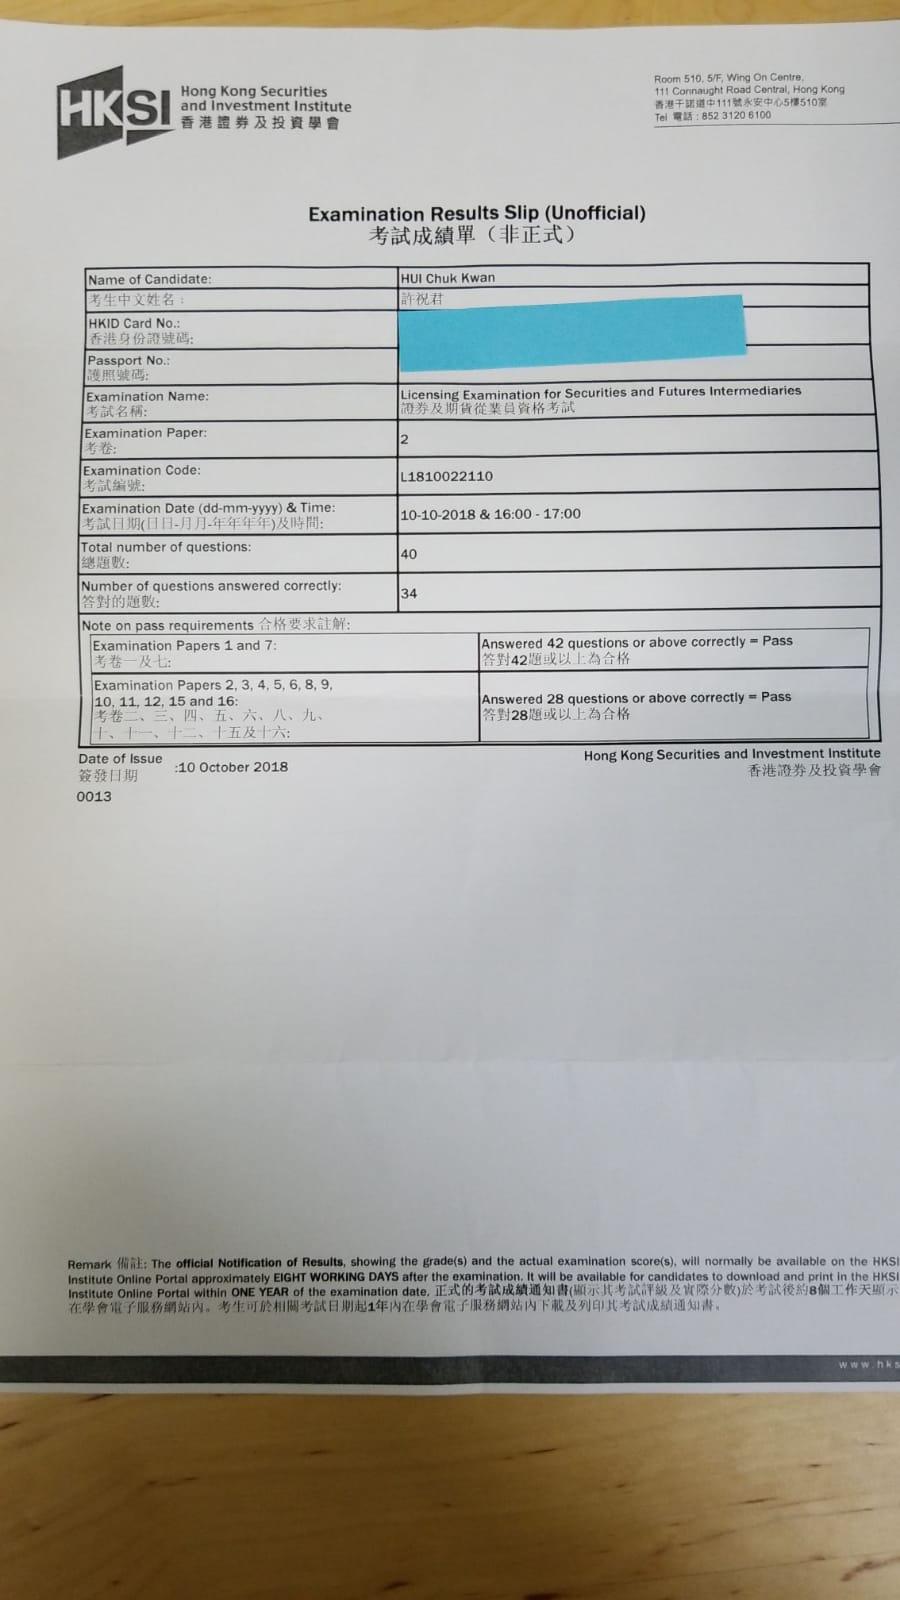 CKH 10/10/2018 LE Paper 2 證券期貨從業員資格考試卷二 Pass